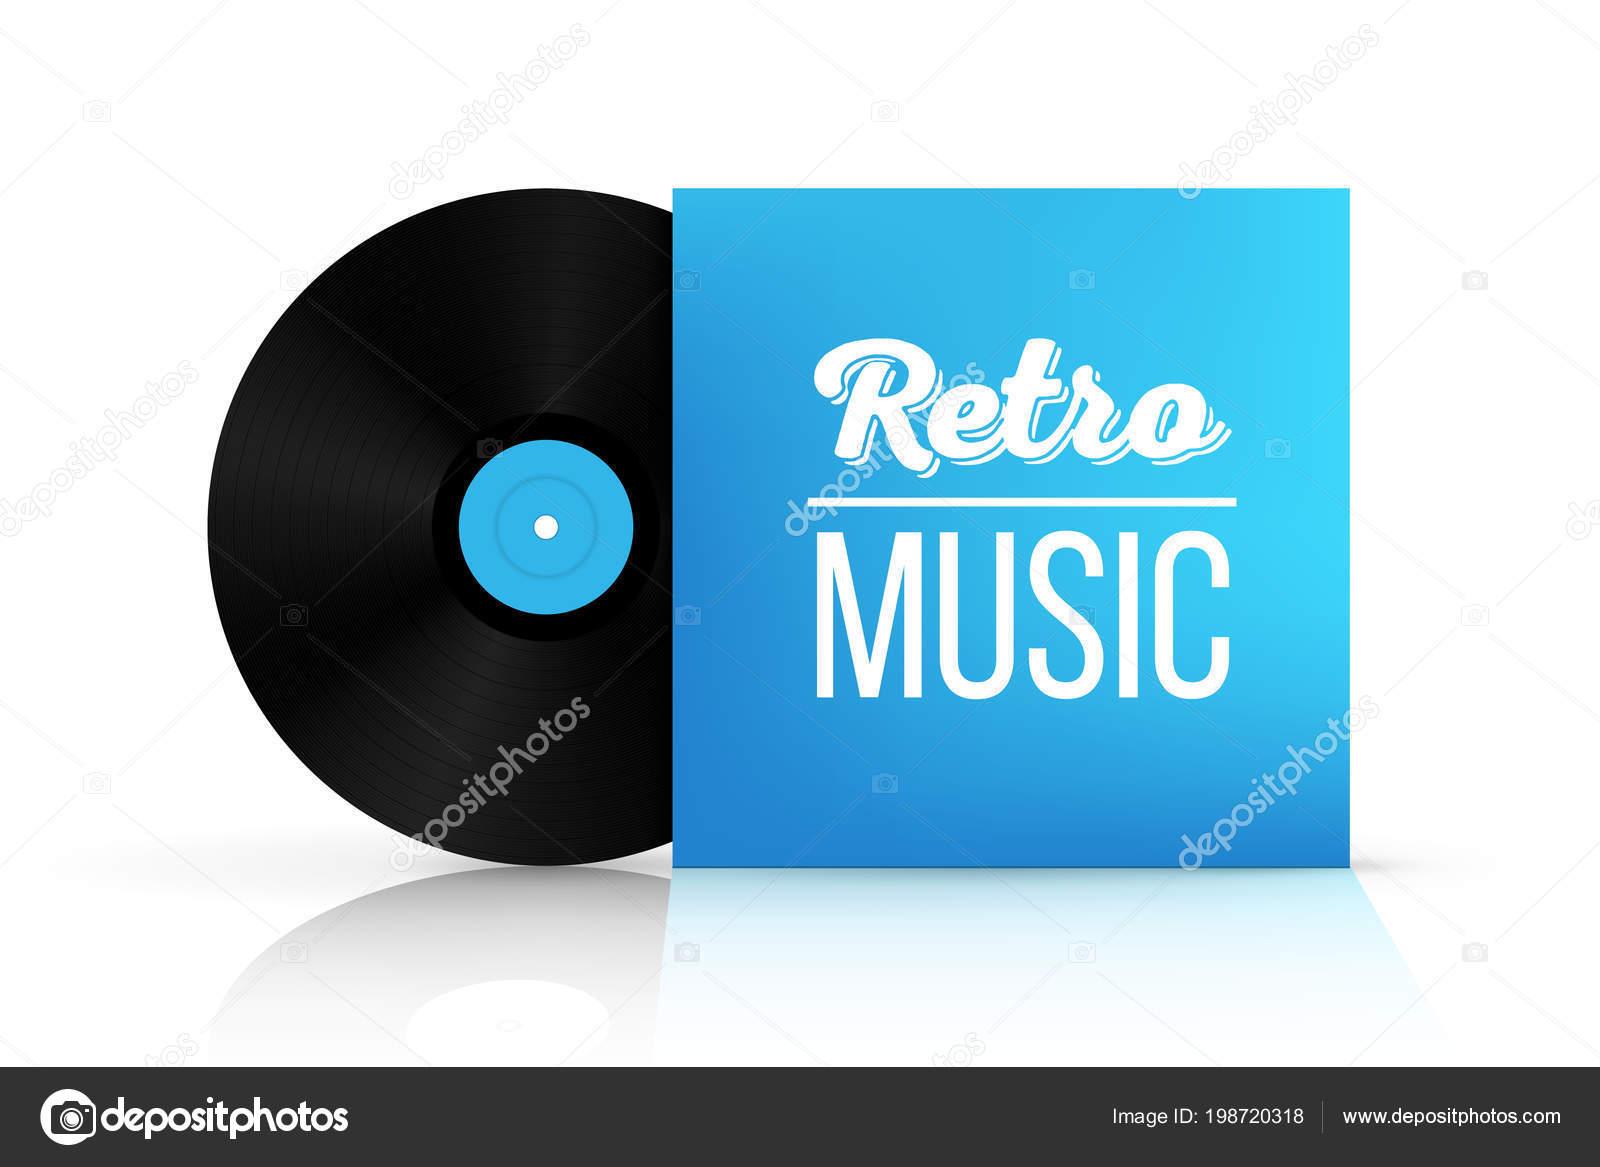 Creative vector illustration realistic vinyl record disk paper case art design blank lp music cover mockup template concept graphic disco party element maxwellsz